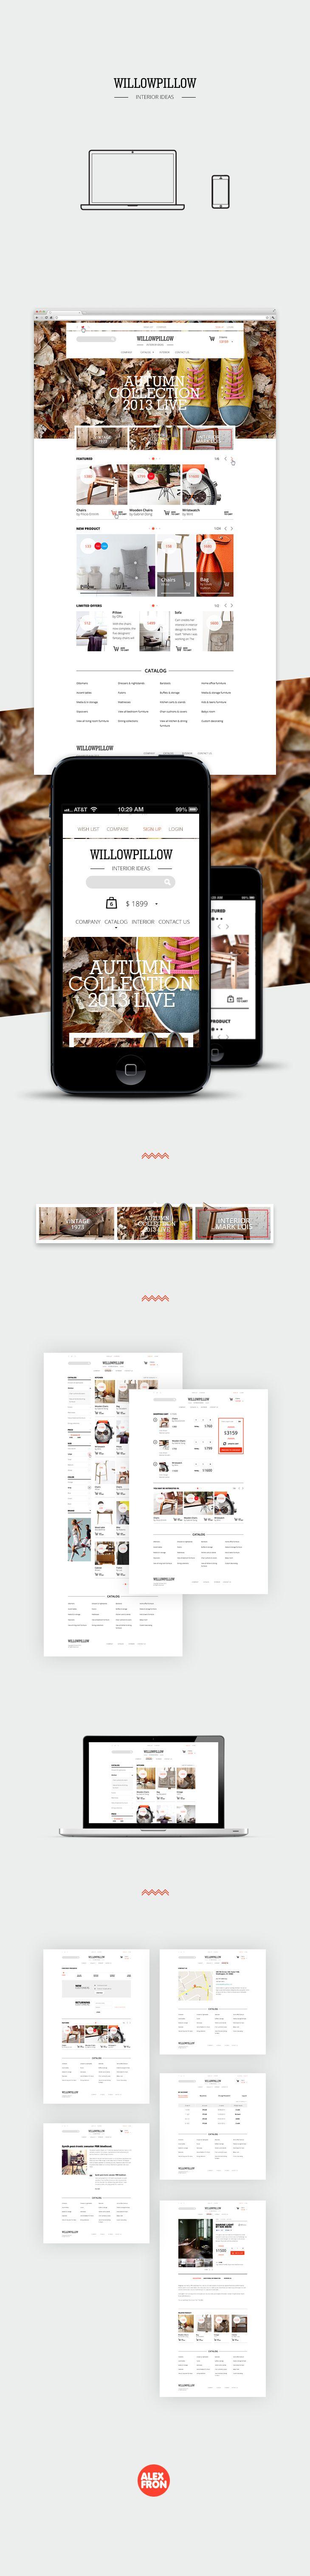 WillowPillow Interior Ideas #webdesign